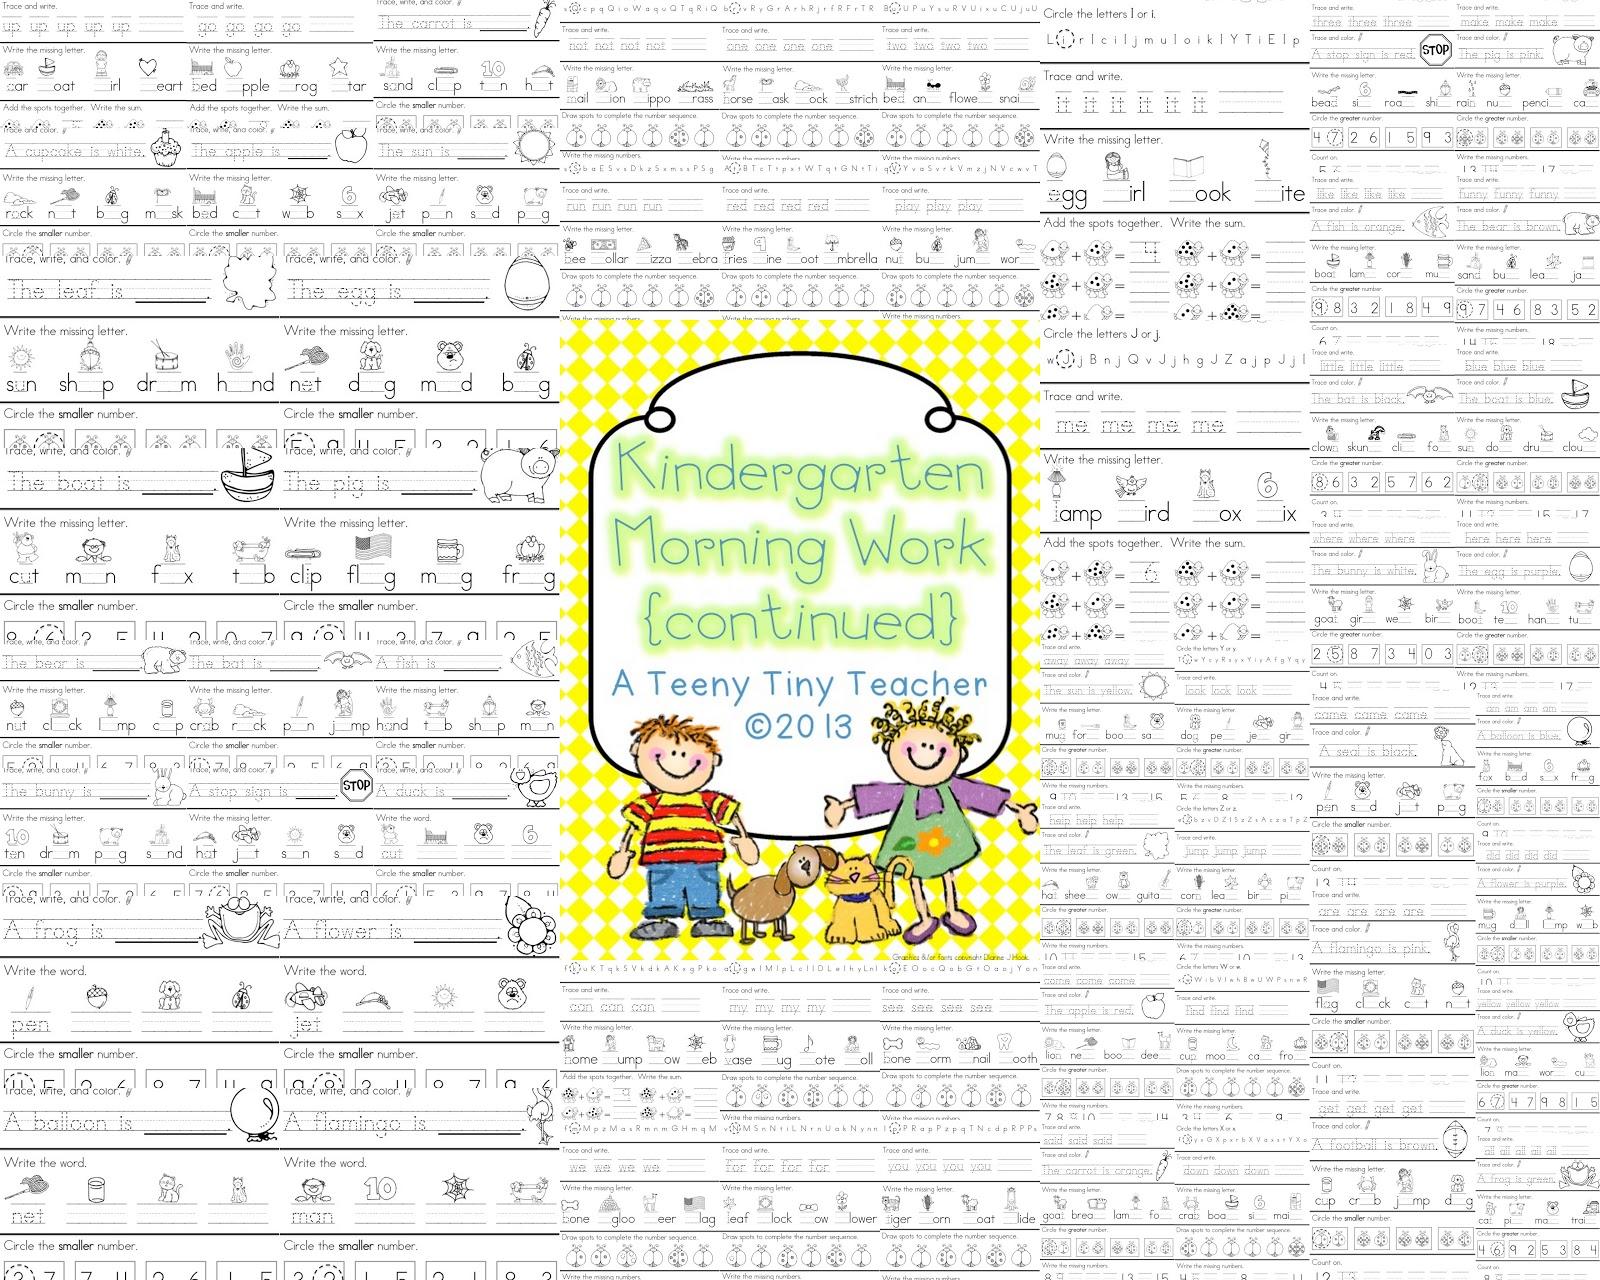 Kindergarten Morning Work Continued